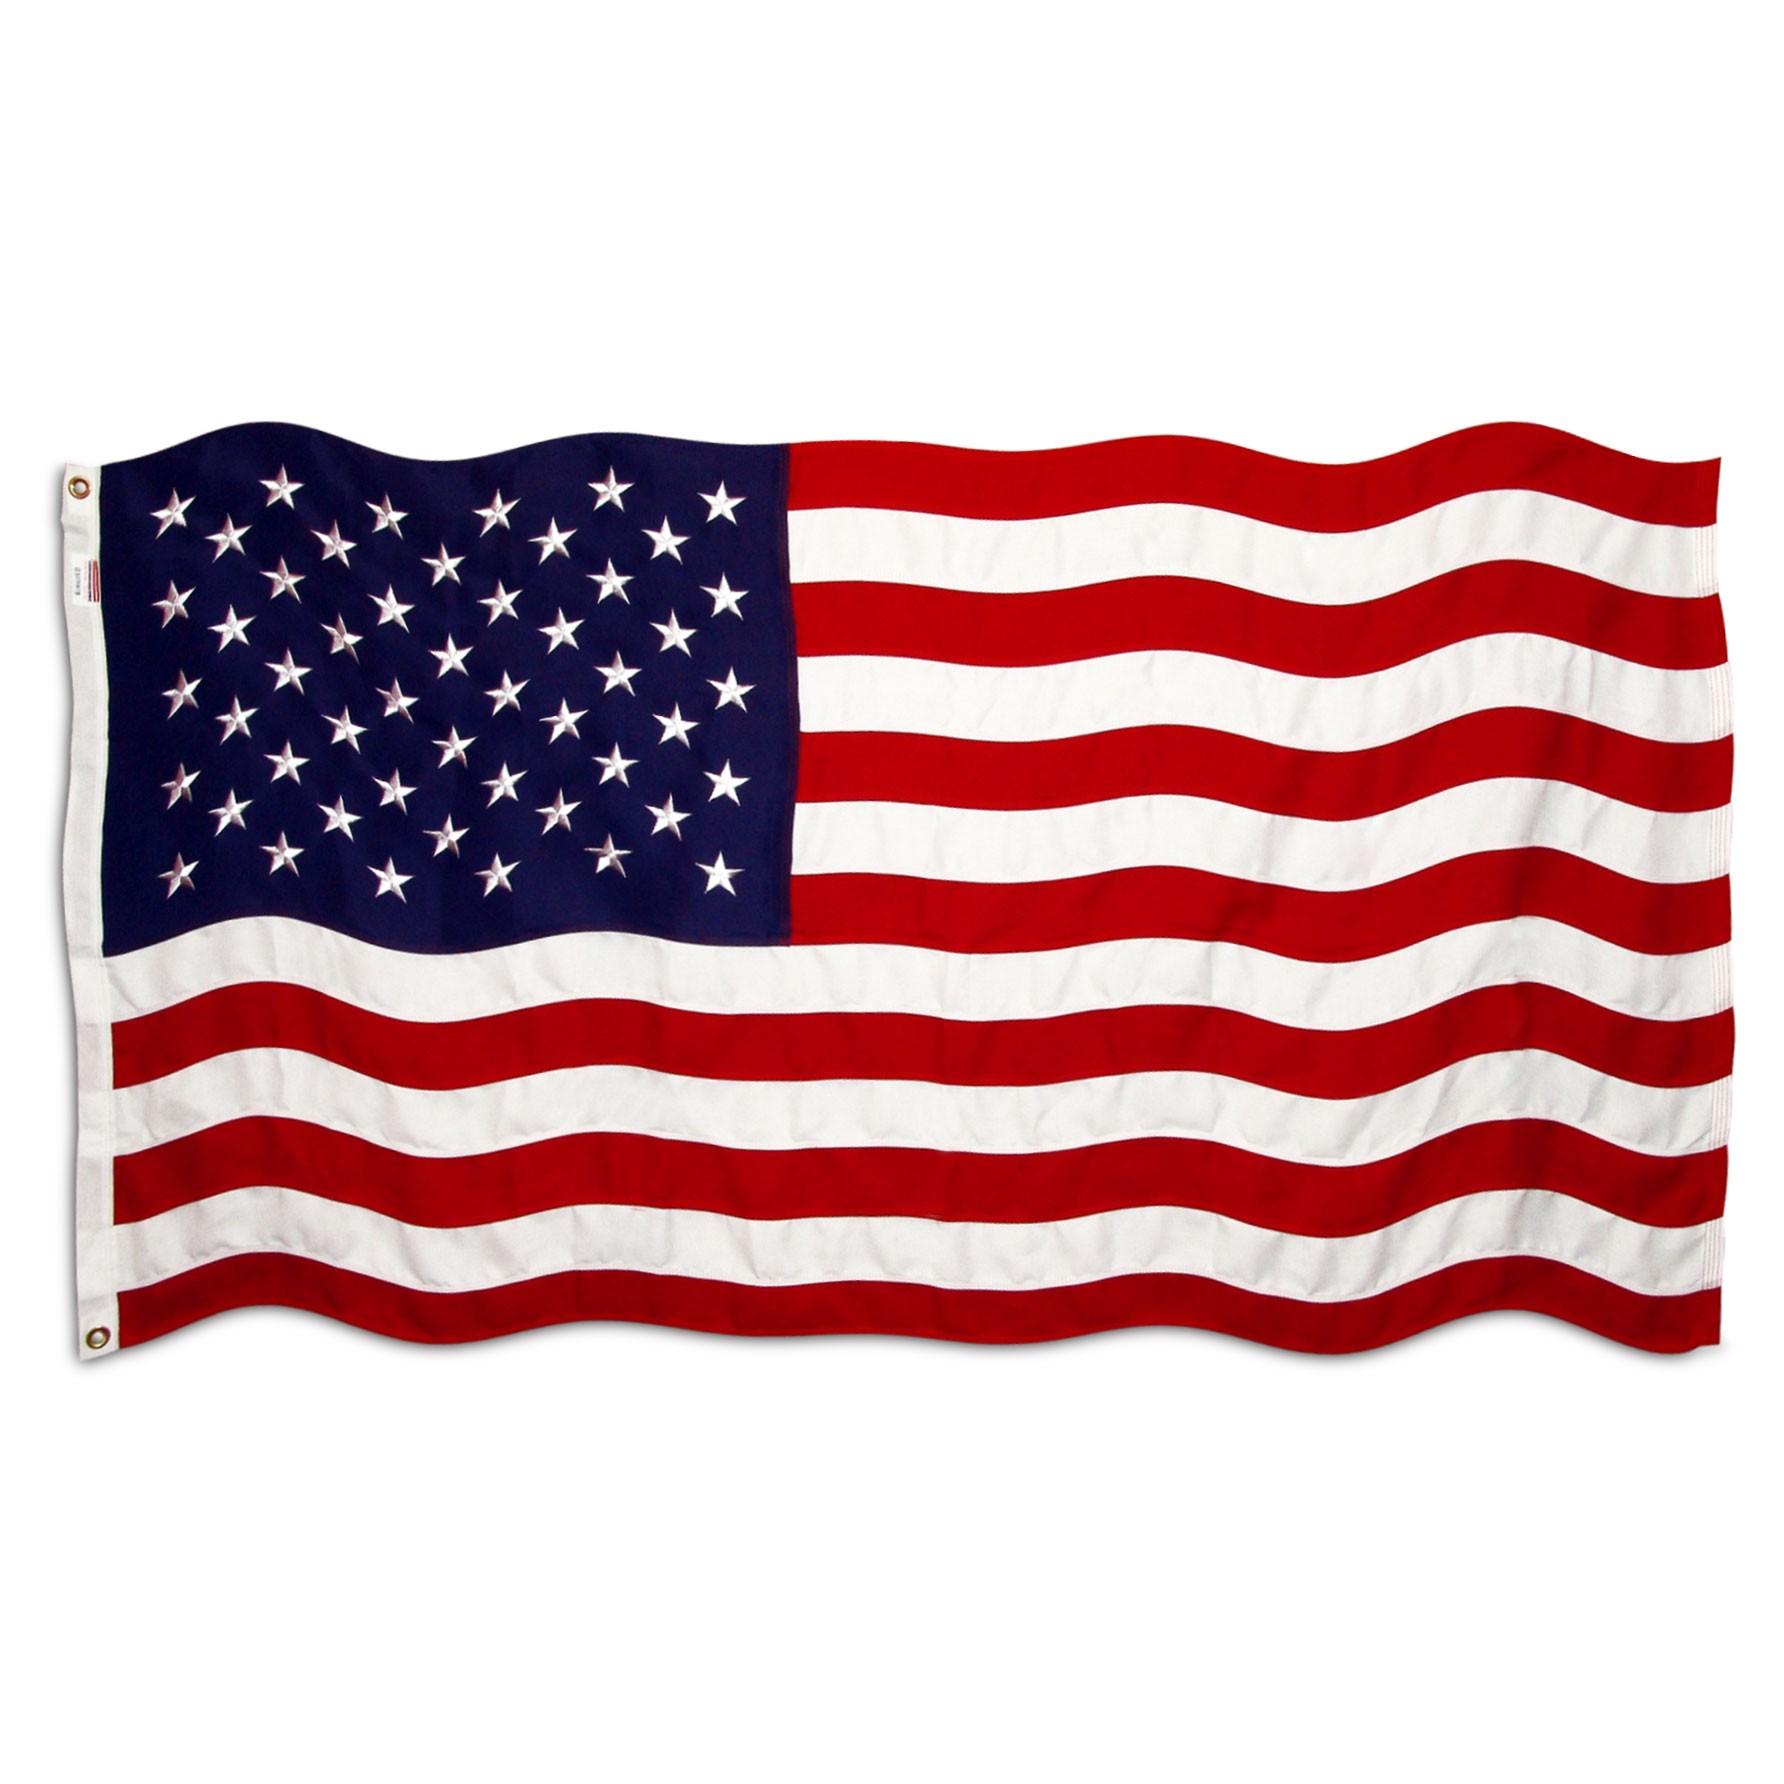 1784x1784 American Flag Clipart 3